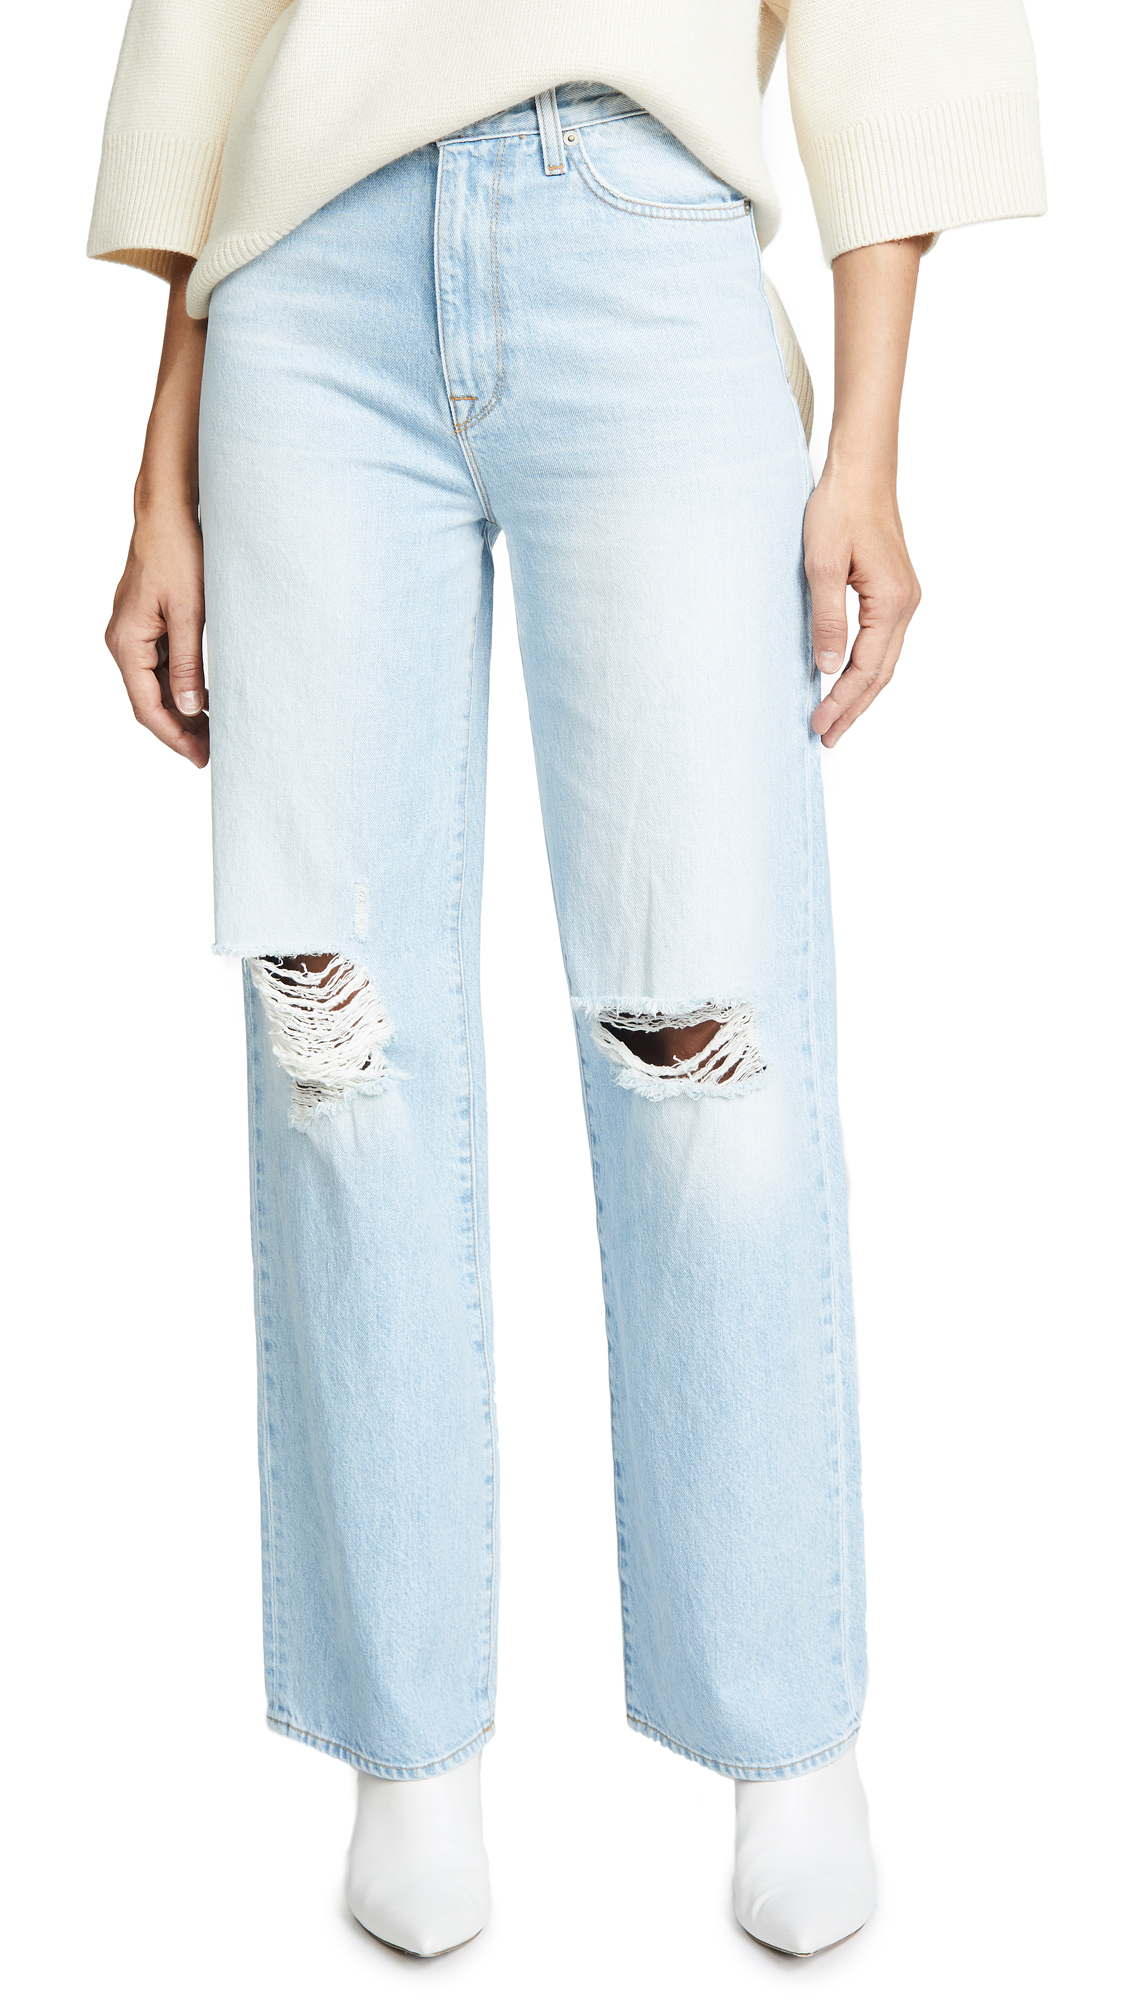 BALDWIN Reese Jeans in Altitude